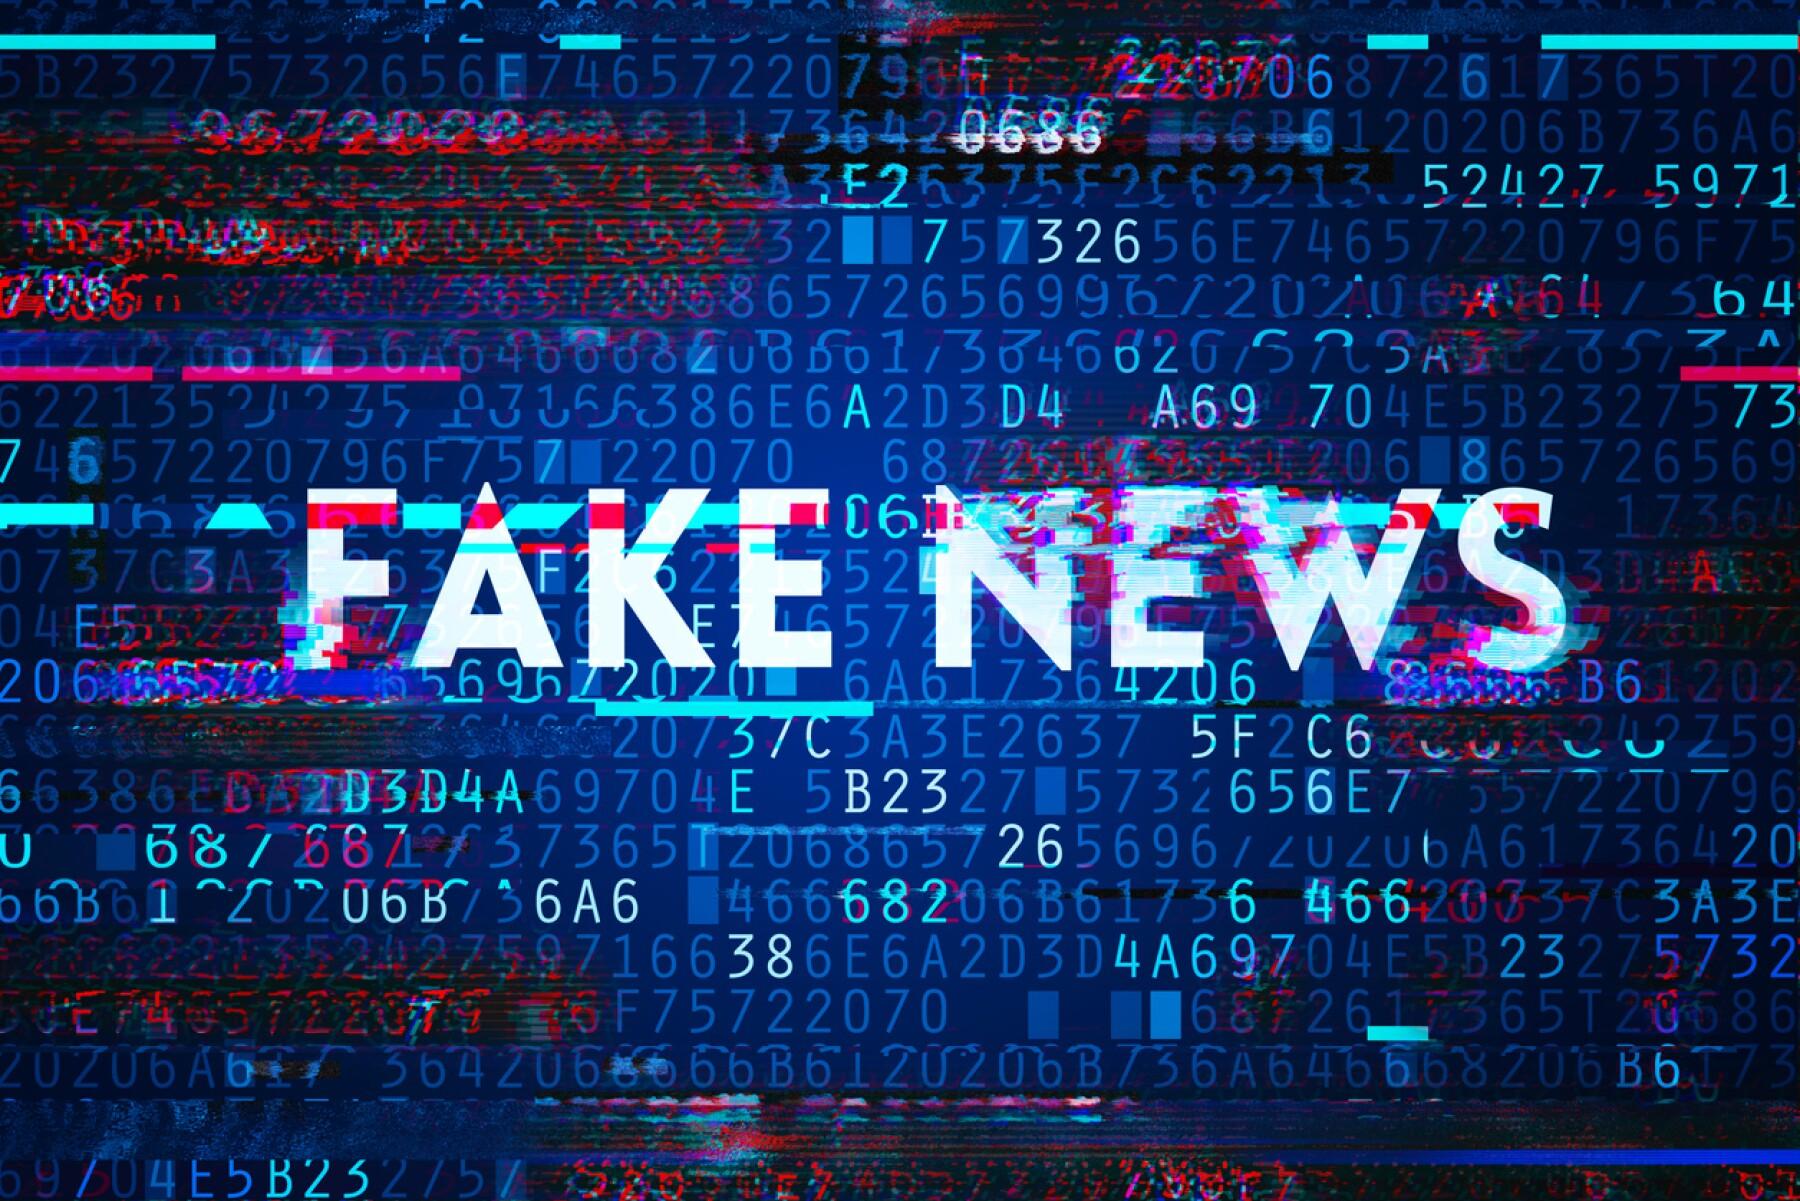 'Fake news'